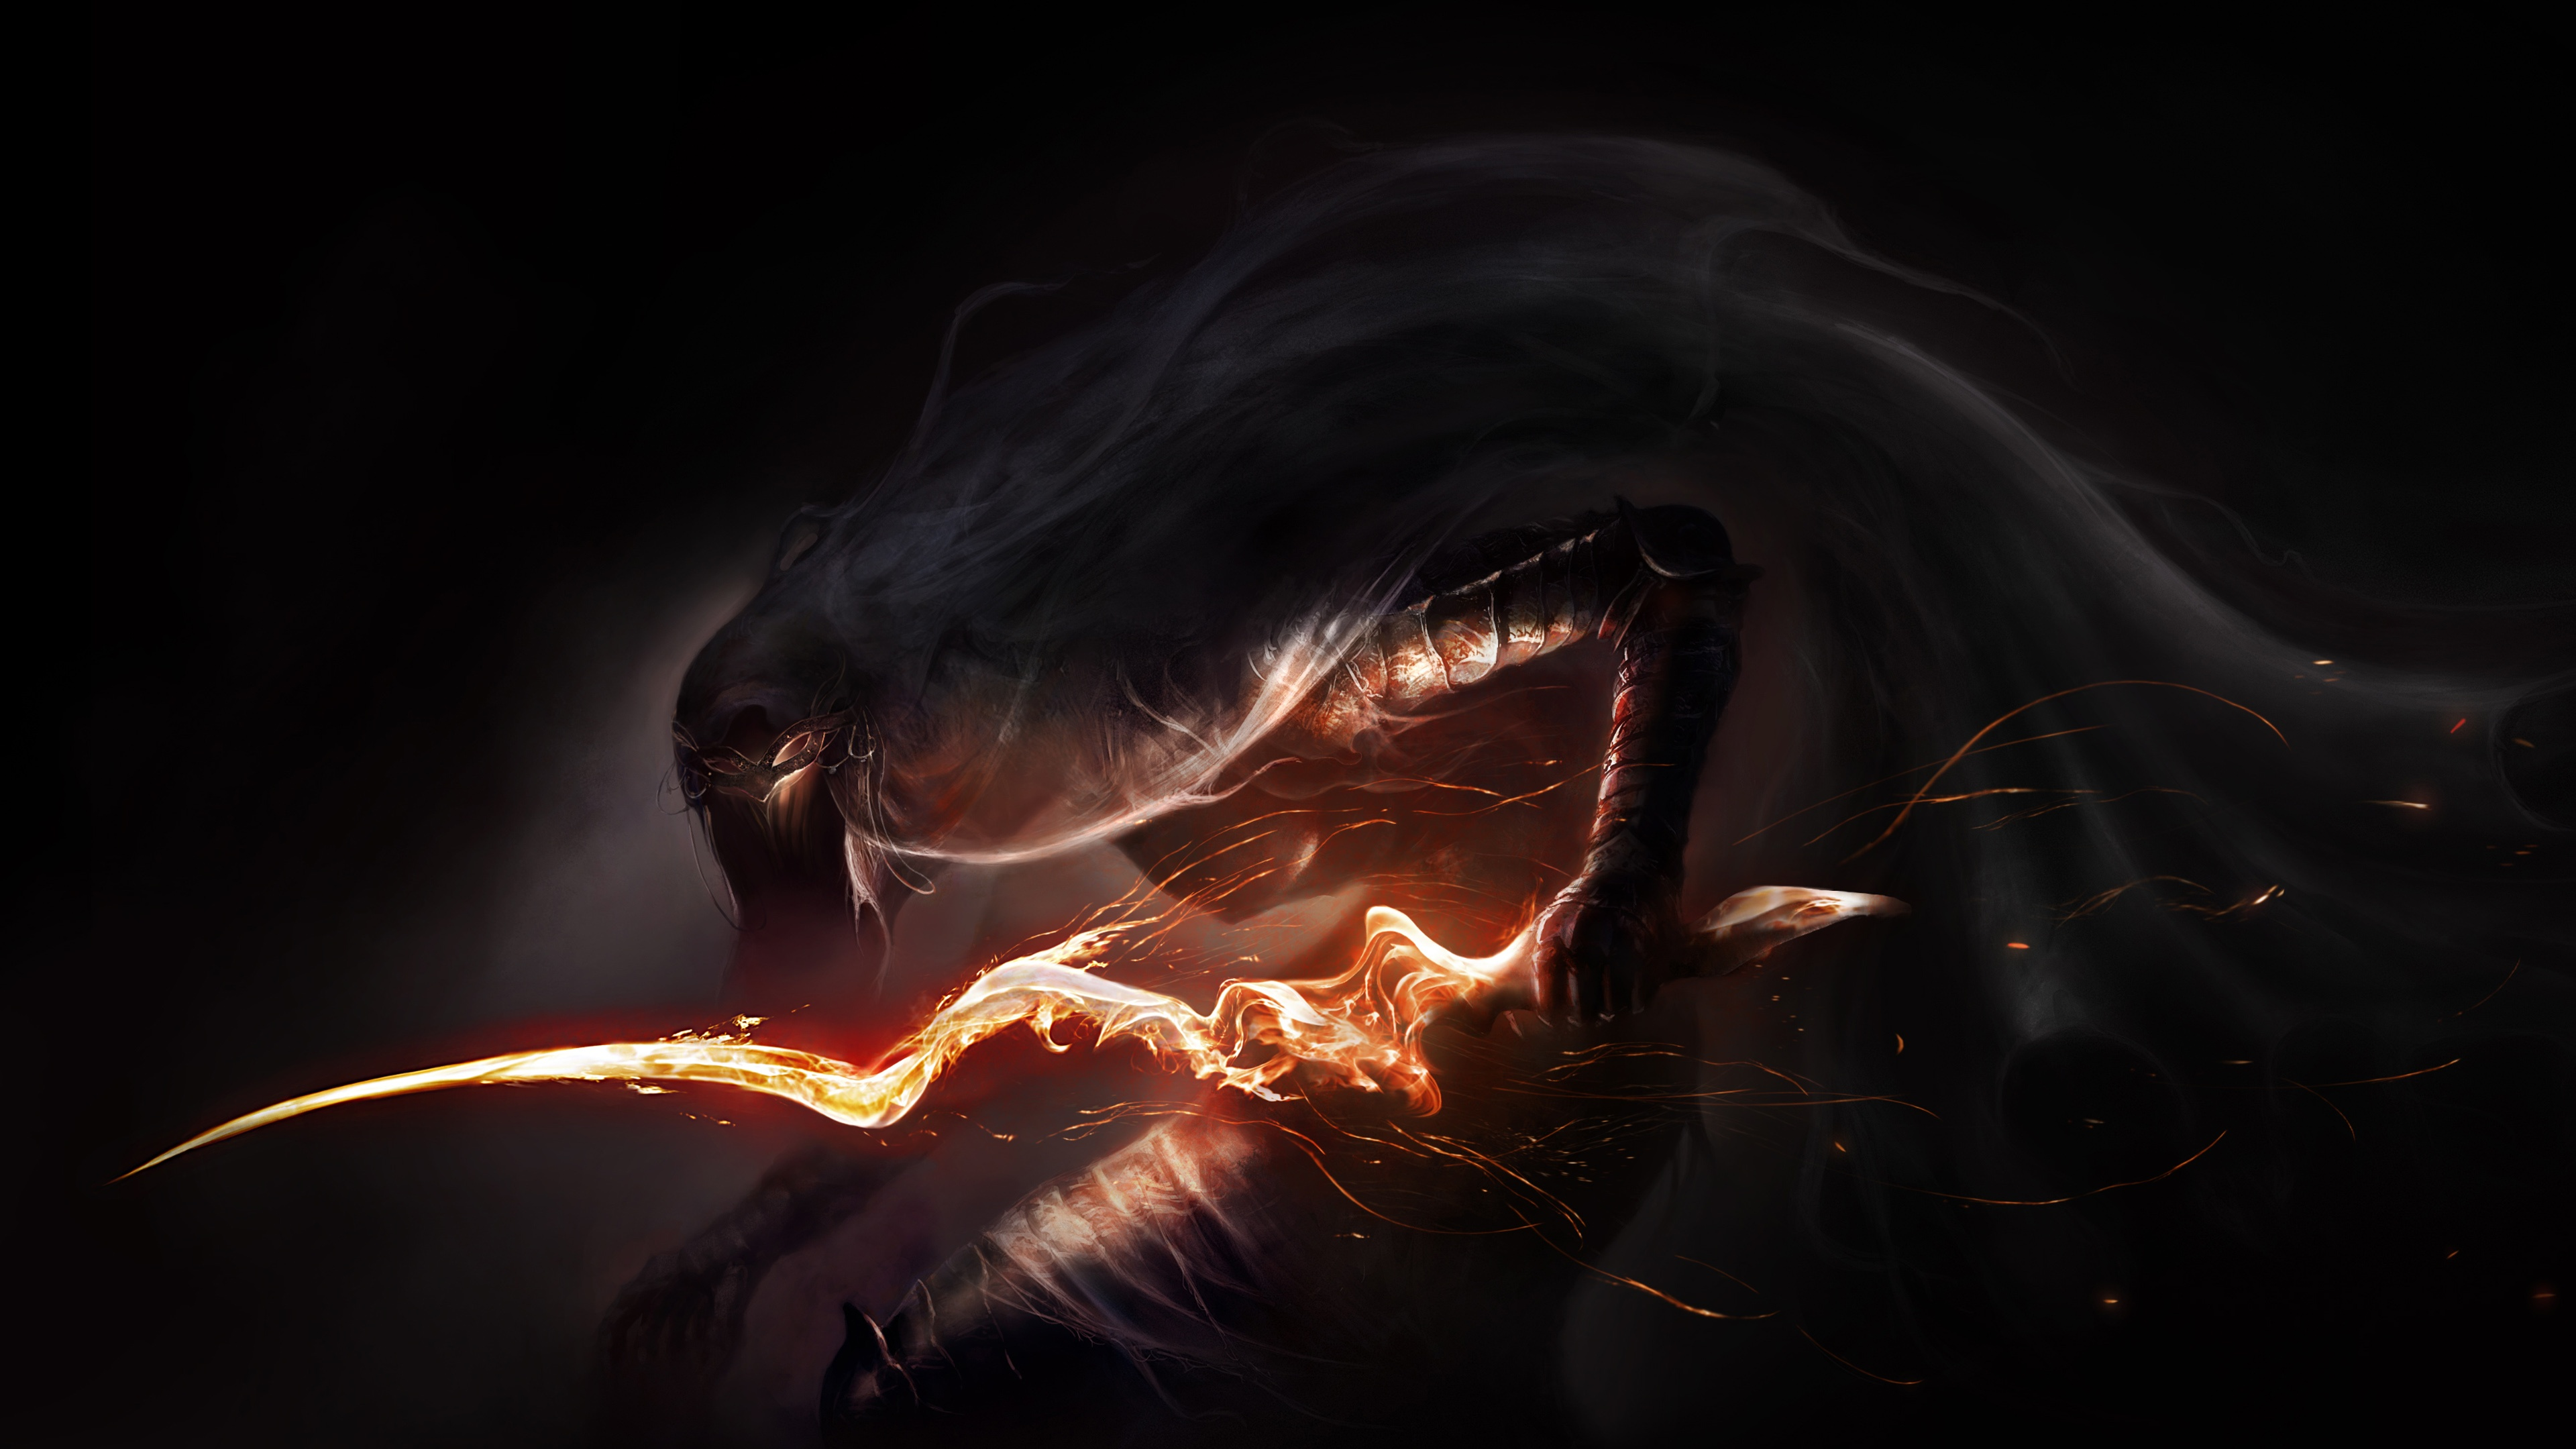 Dark Souls Iii Monster Concept Wallpapers In Jpg Format For Free